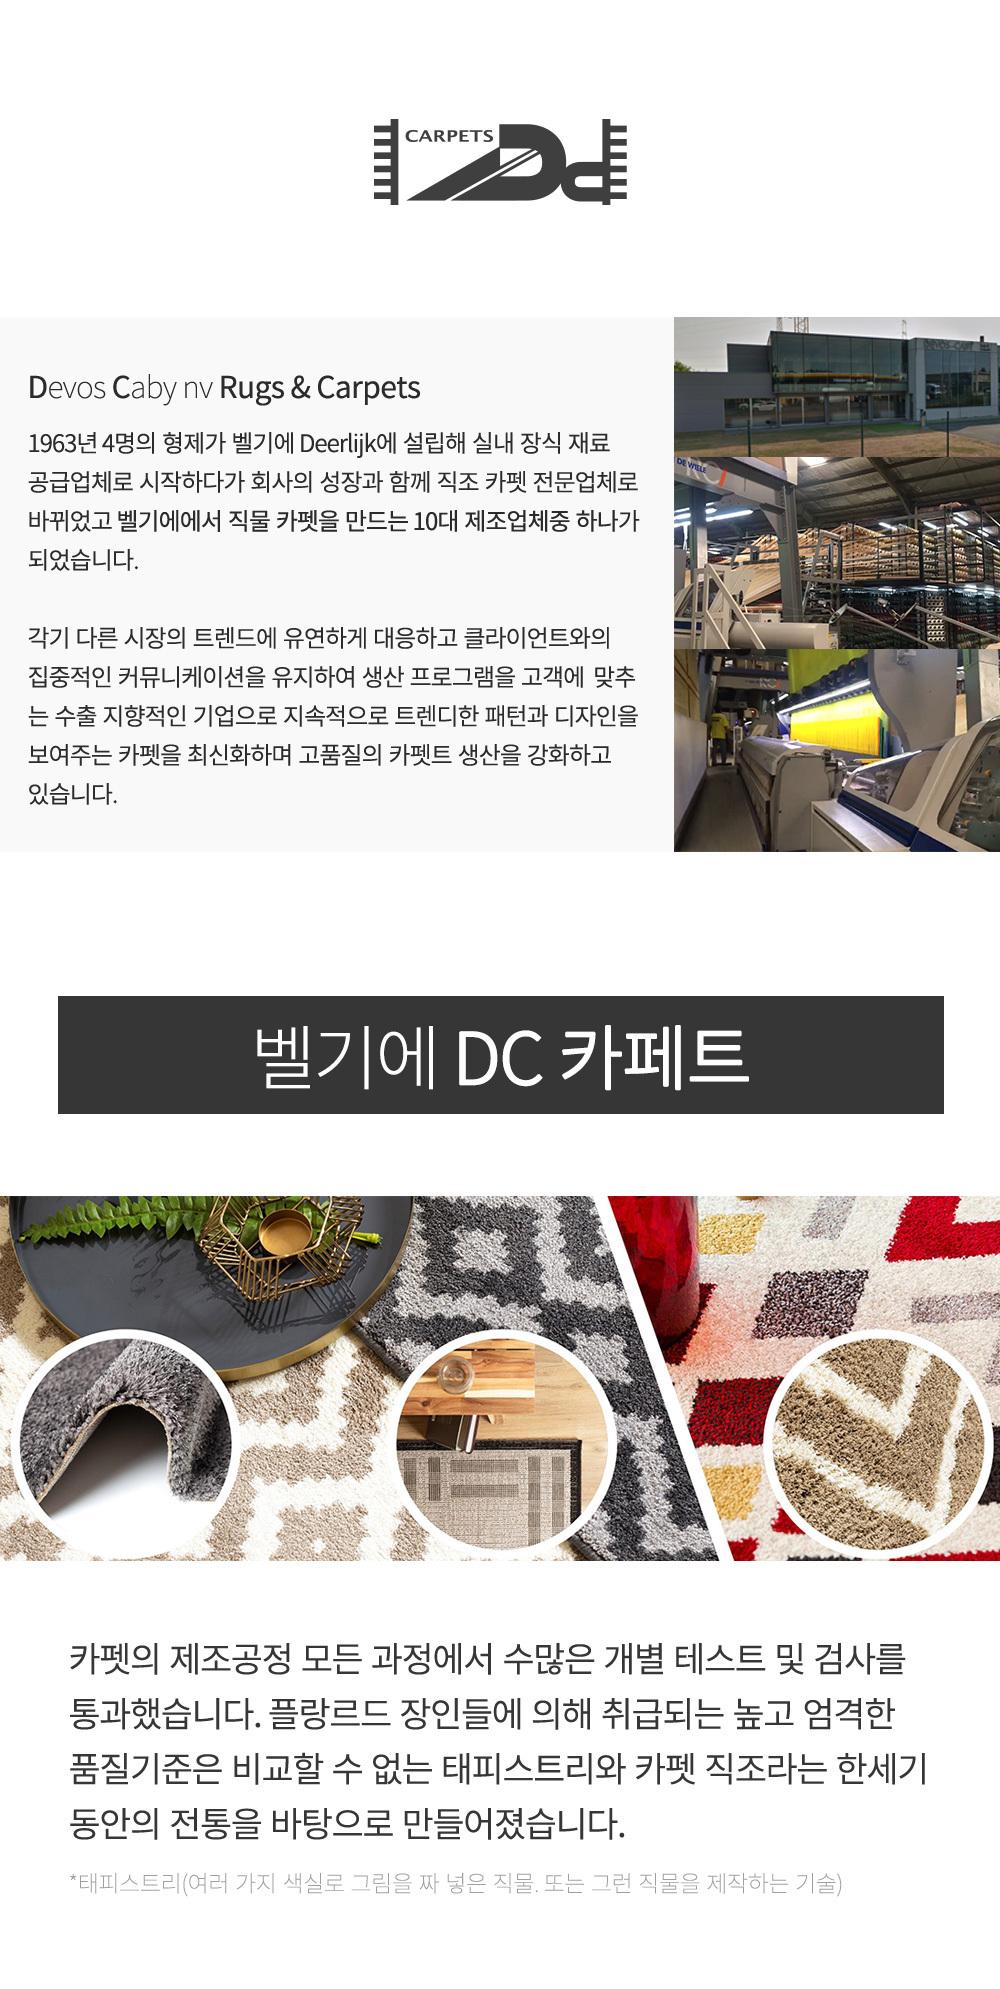 Devos caby ny rugs & carpets - 벨기에 DC 카페트 소개